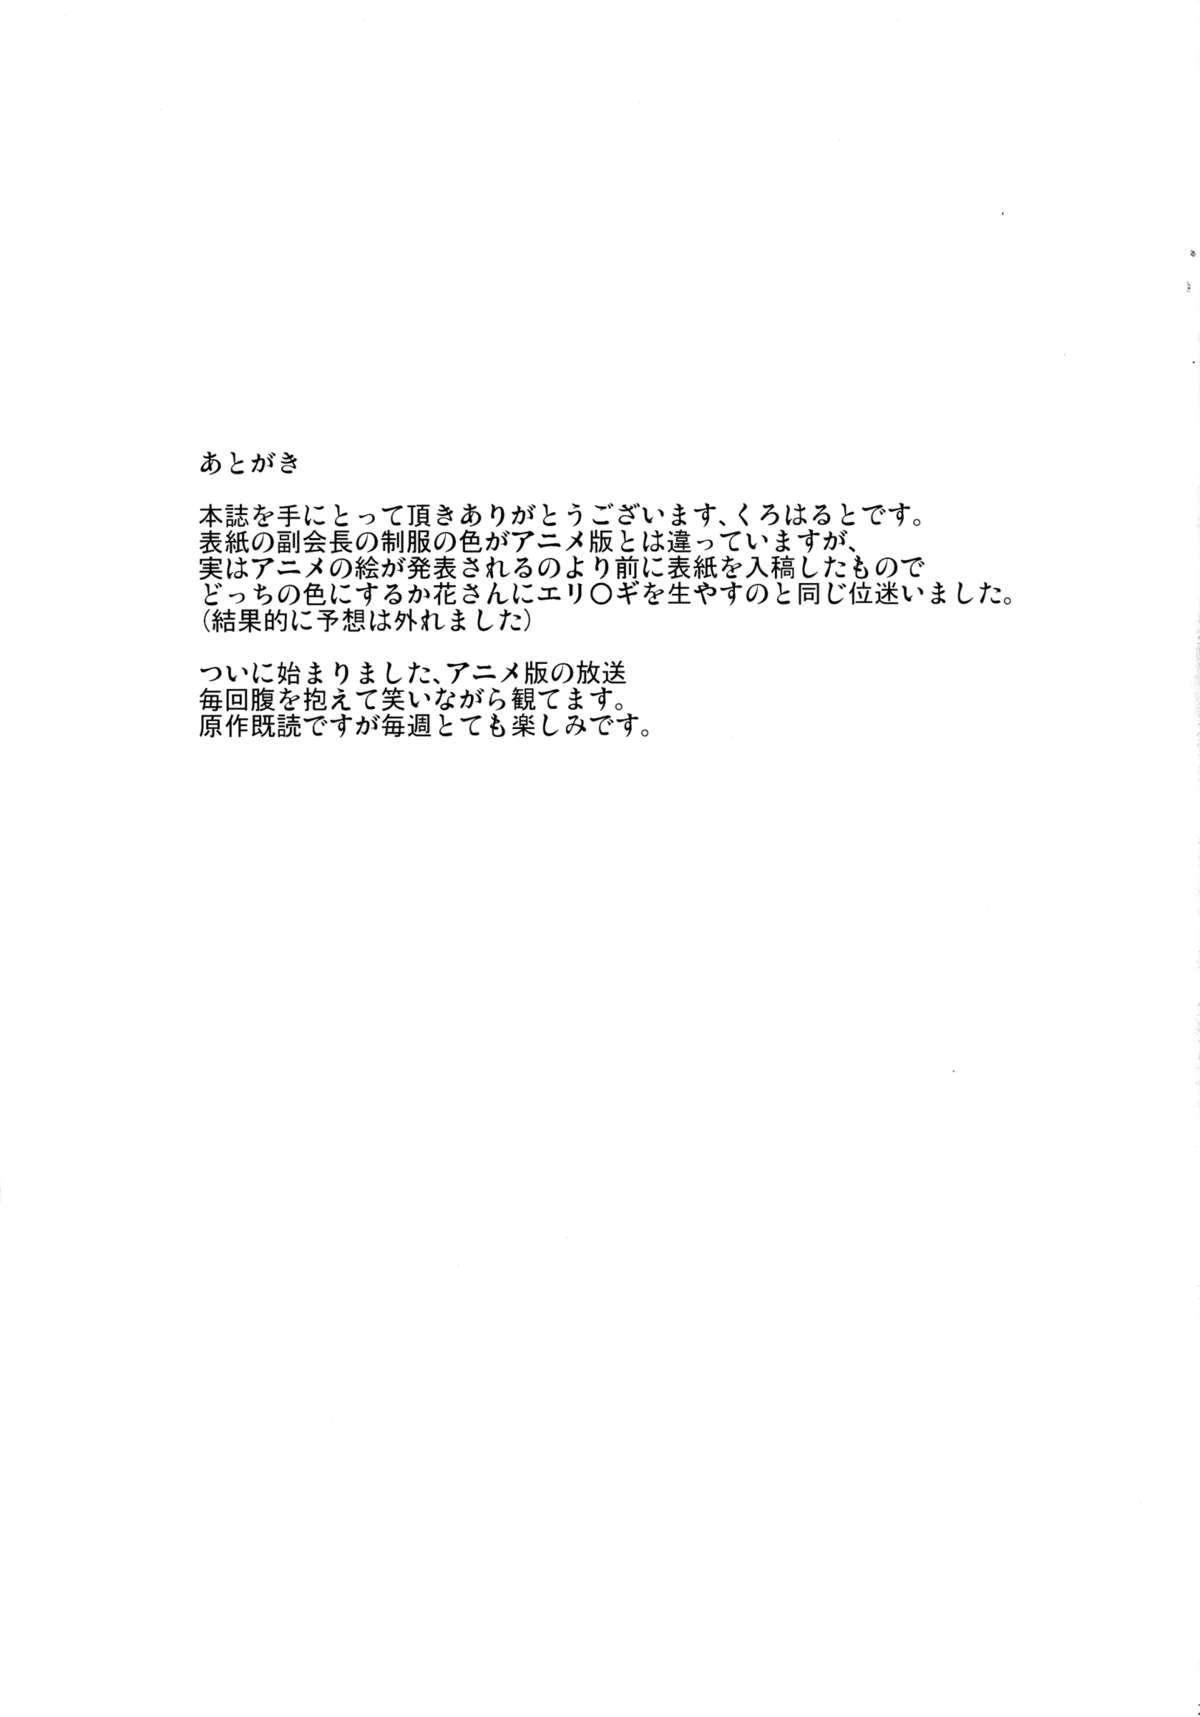 Kangoku ni Sakuhana to Hana - The Belle and Flower in prison 22